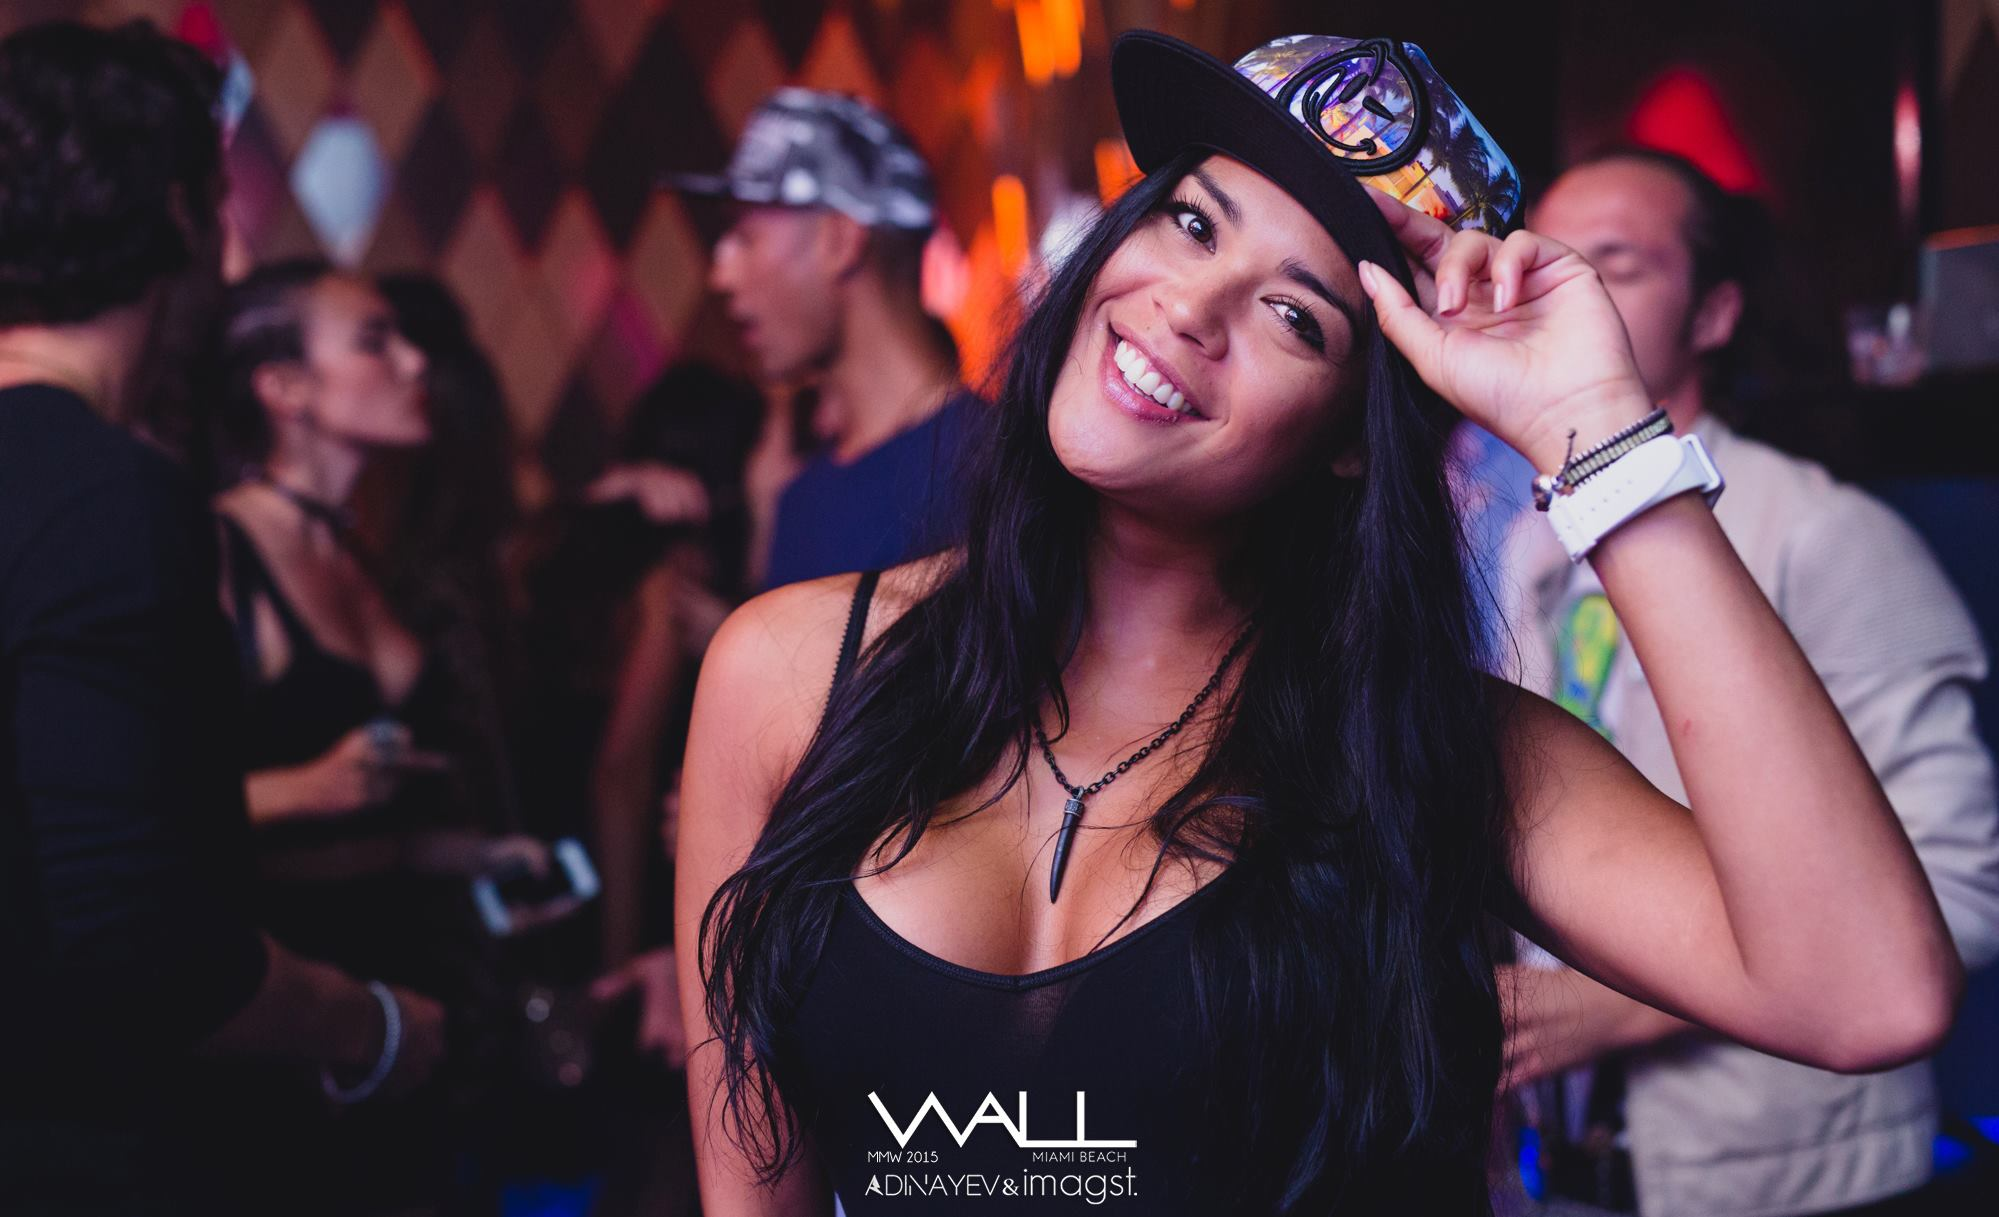 Hot girls in Miami club